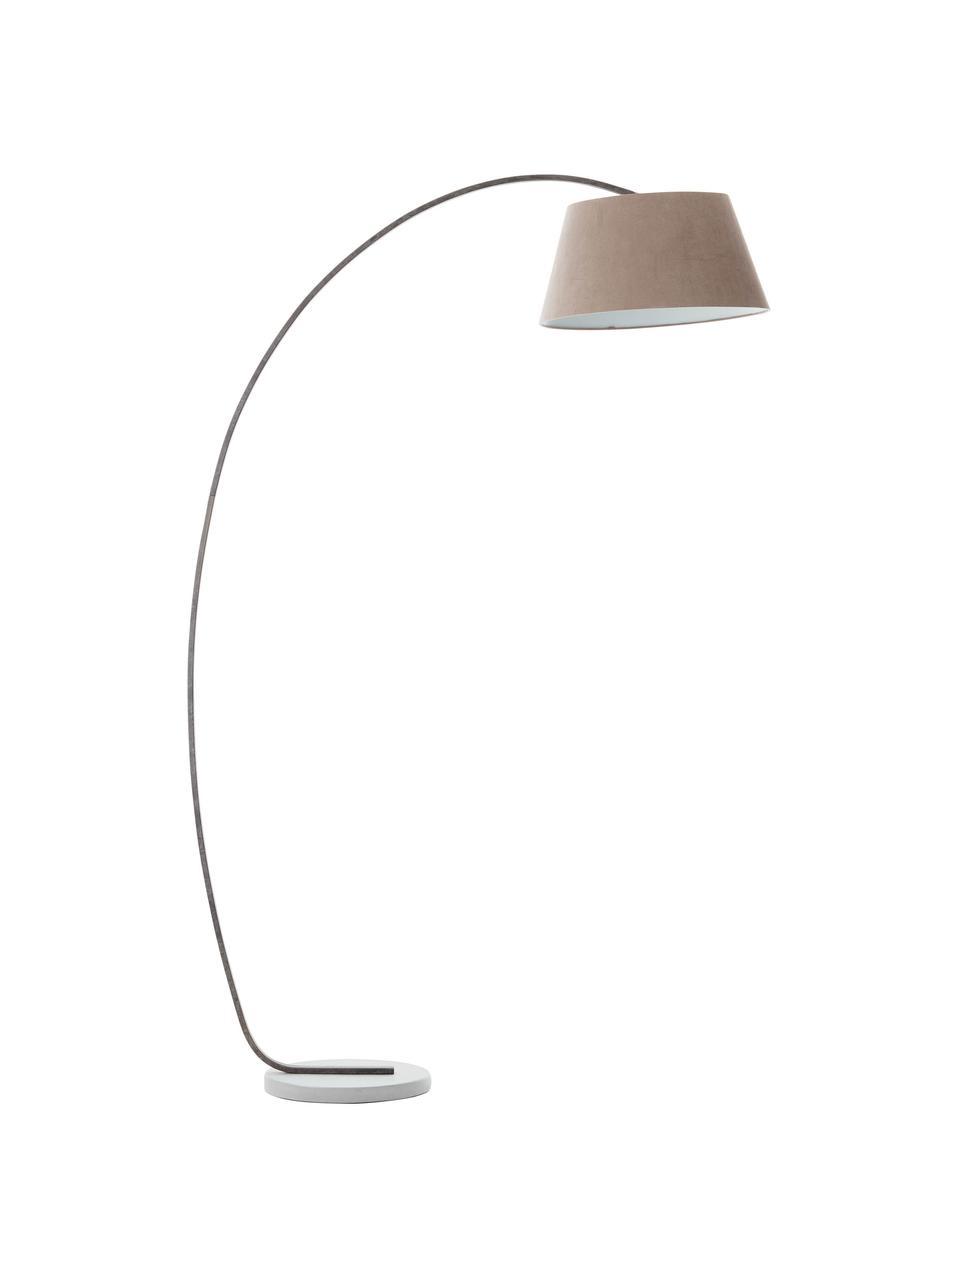 Design Bogenlampe Brok mit Antik-Finish, Lampenschirm: Flanell, Lampenfuß: Metall, Sockel: Beton, Grau, 50 x 196 cm